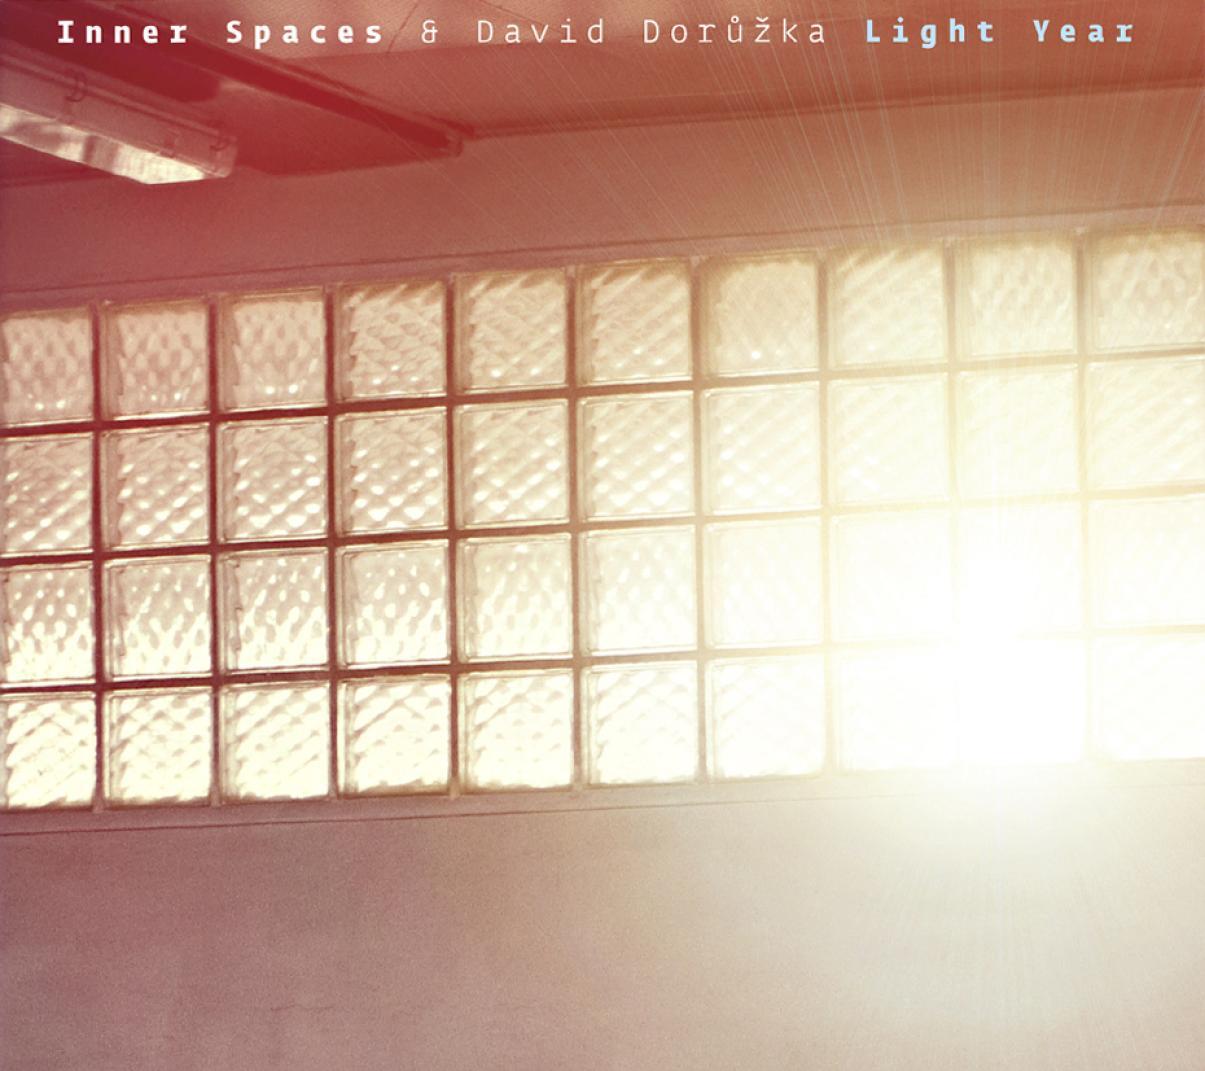 Inner Spaces & David Dorůžka: Light Year